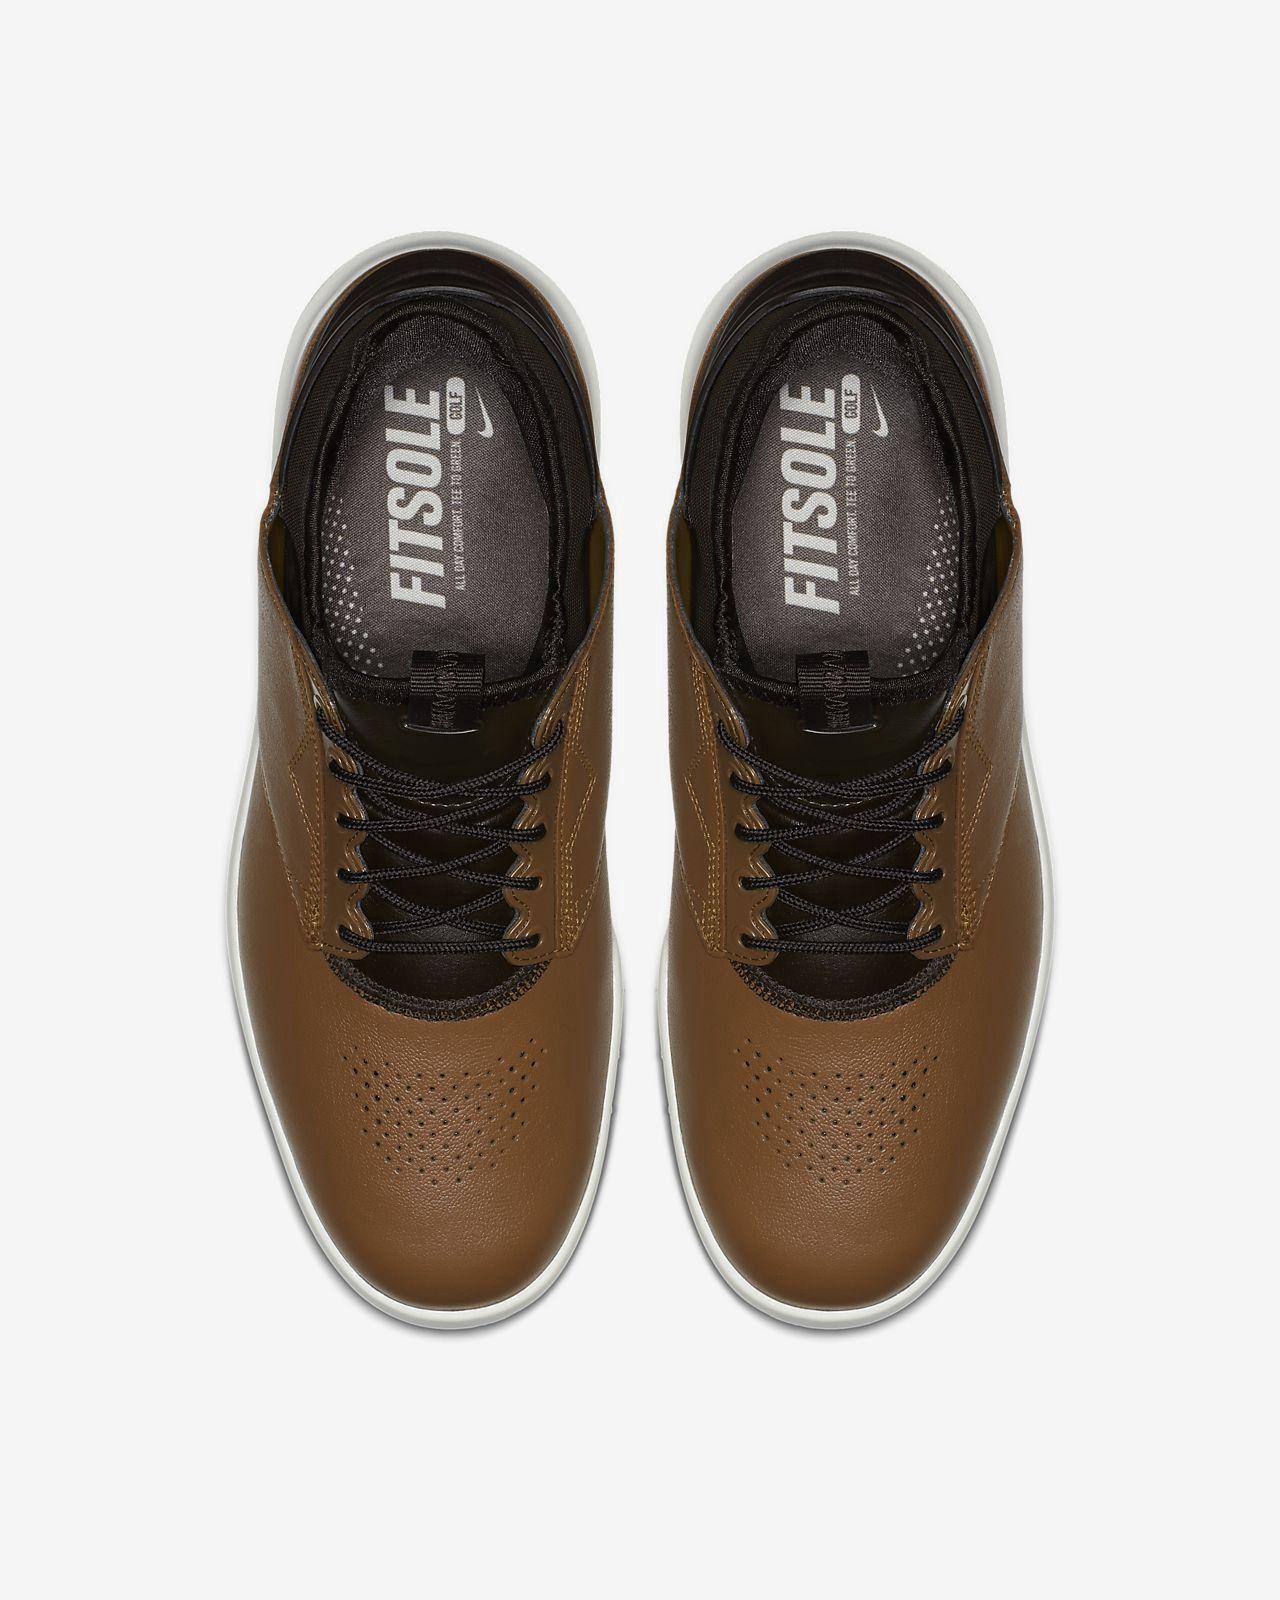 0b6d9b0fff Nike Air Zoom Direct Men s Golf Shoe - 11.5 Platinum  DirectGolf ...